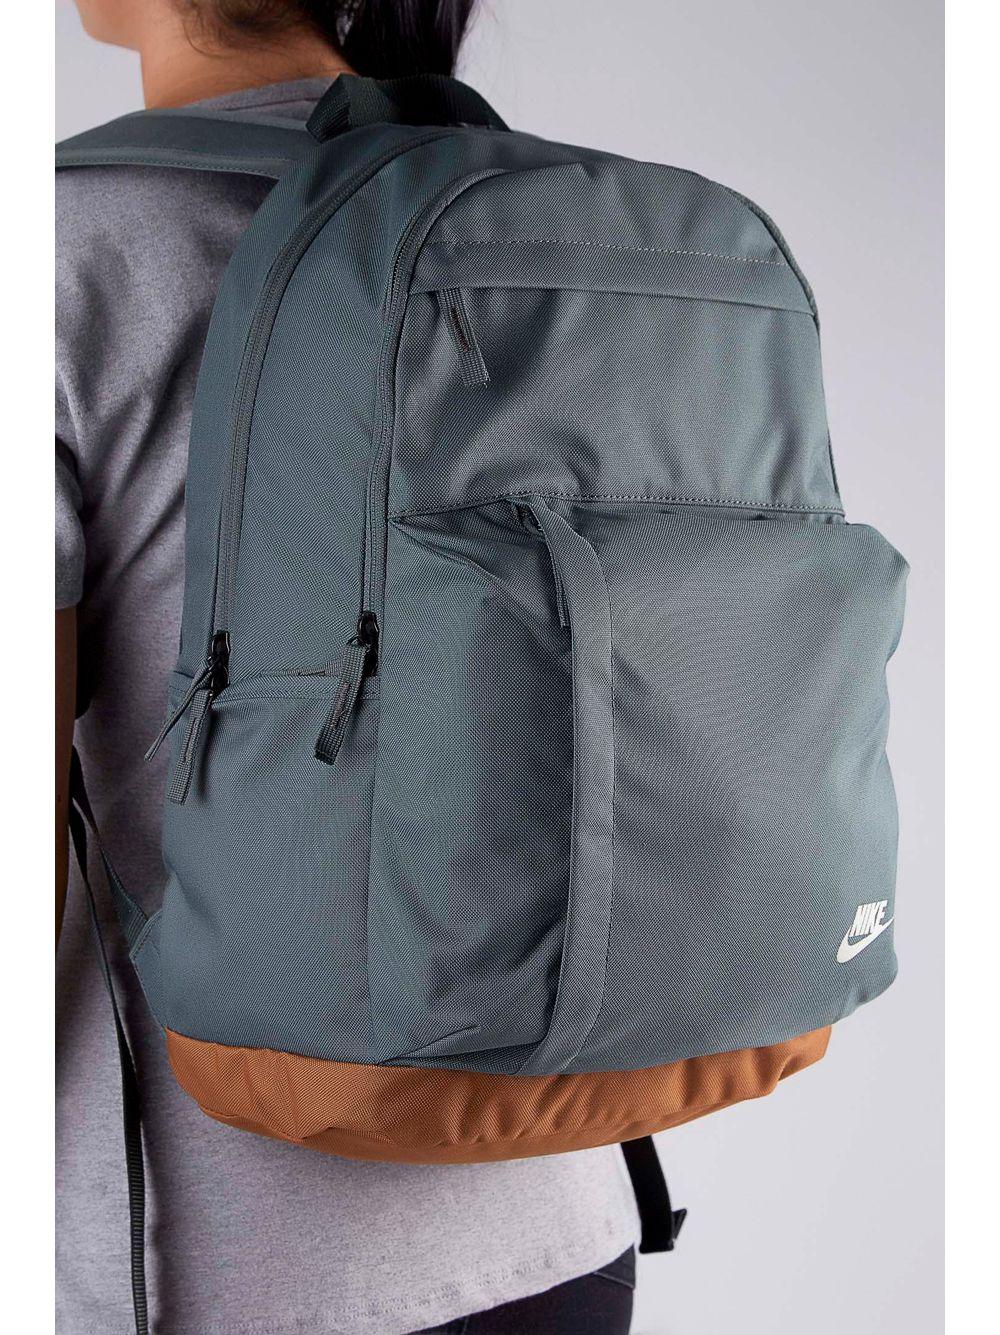 e56875b6d Previous. Mochila-Nike-Elemental-Verde-Escuro ...